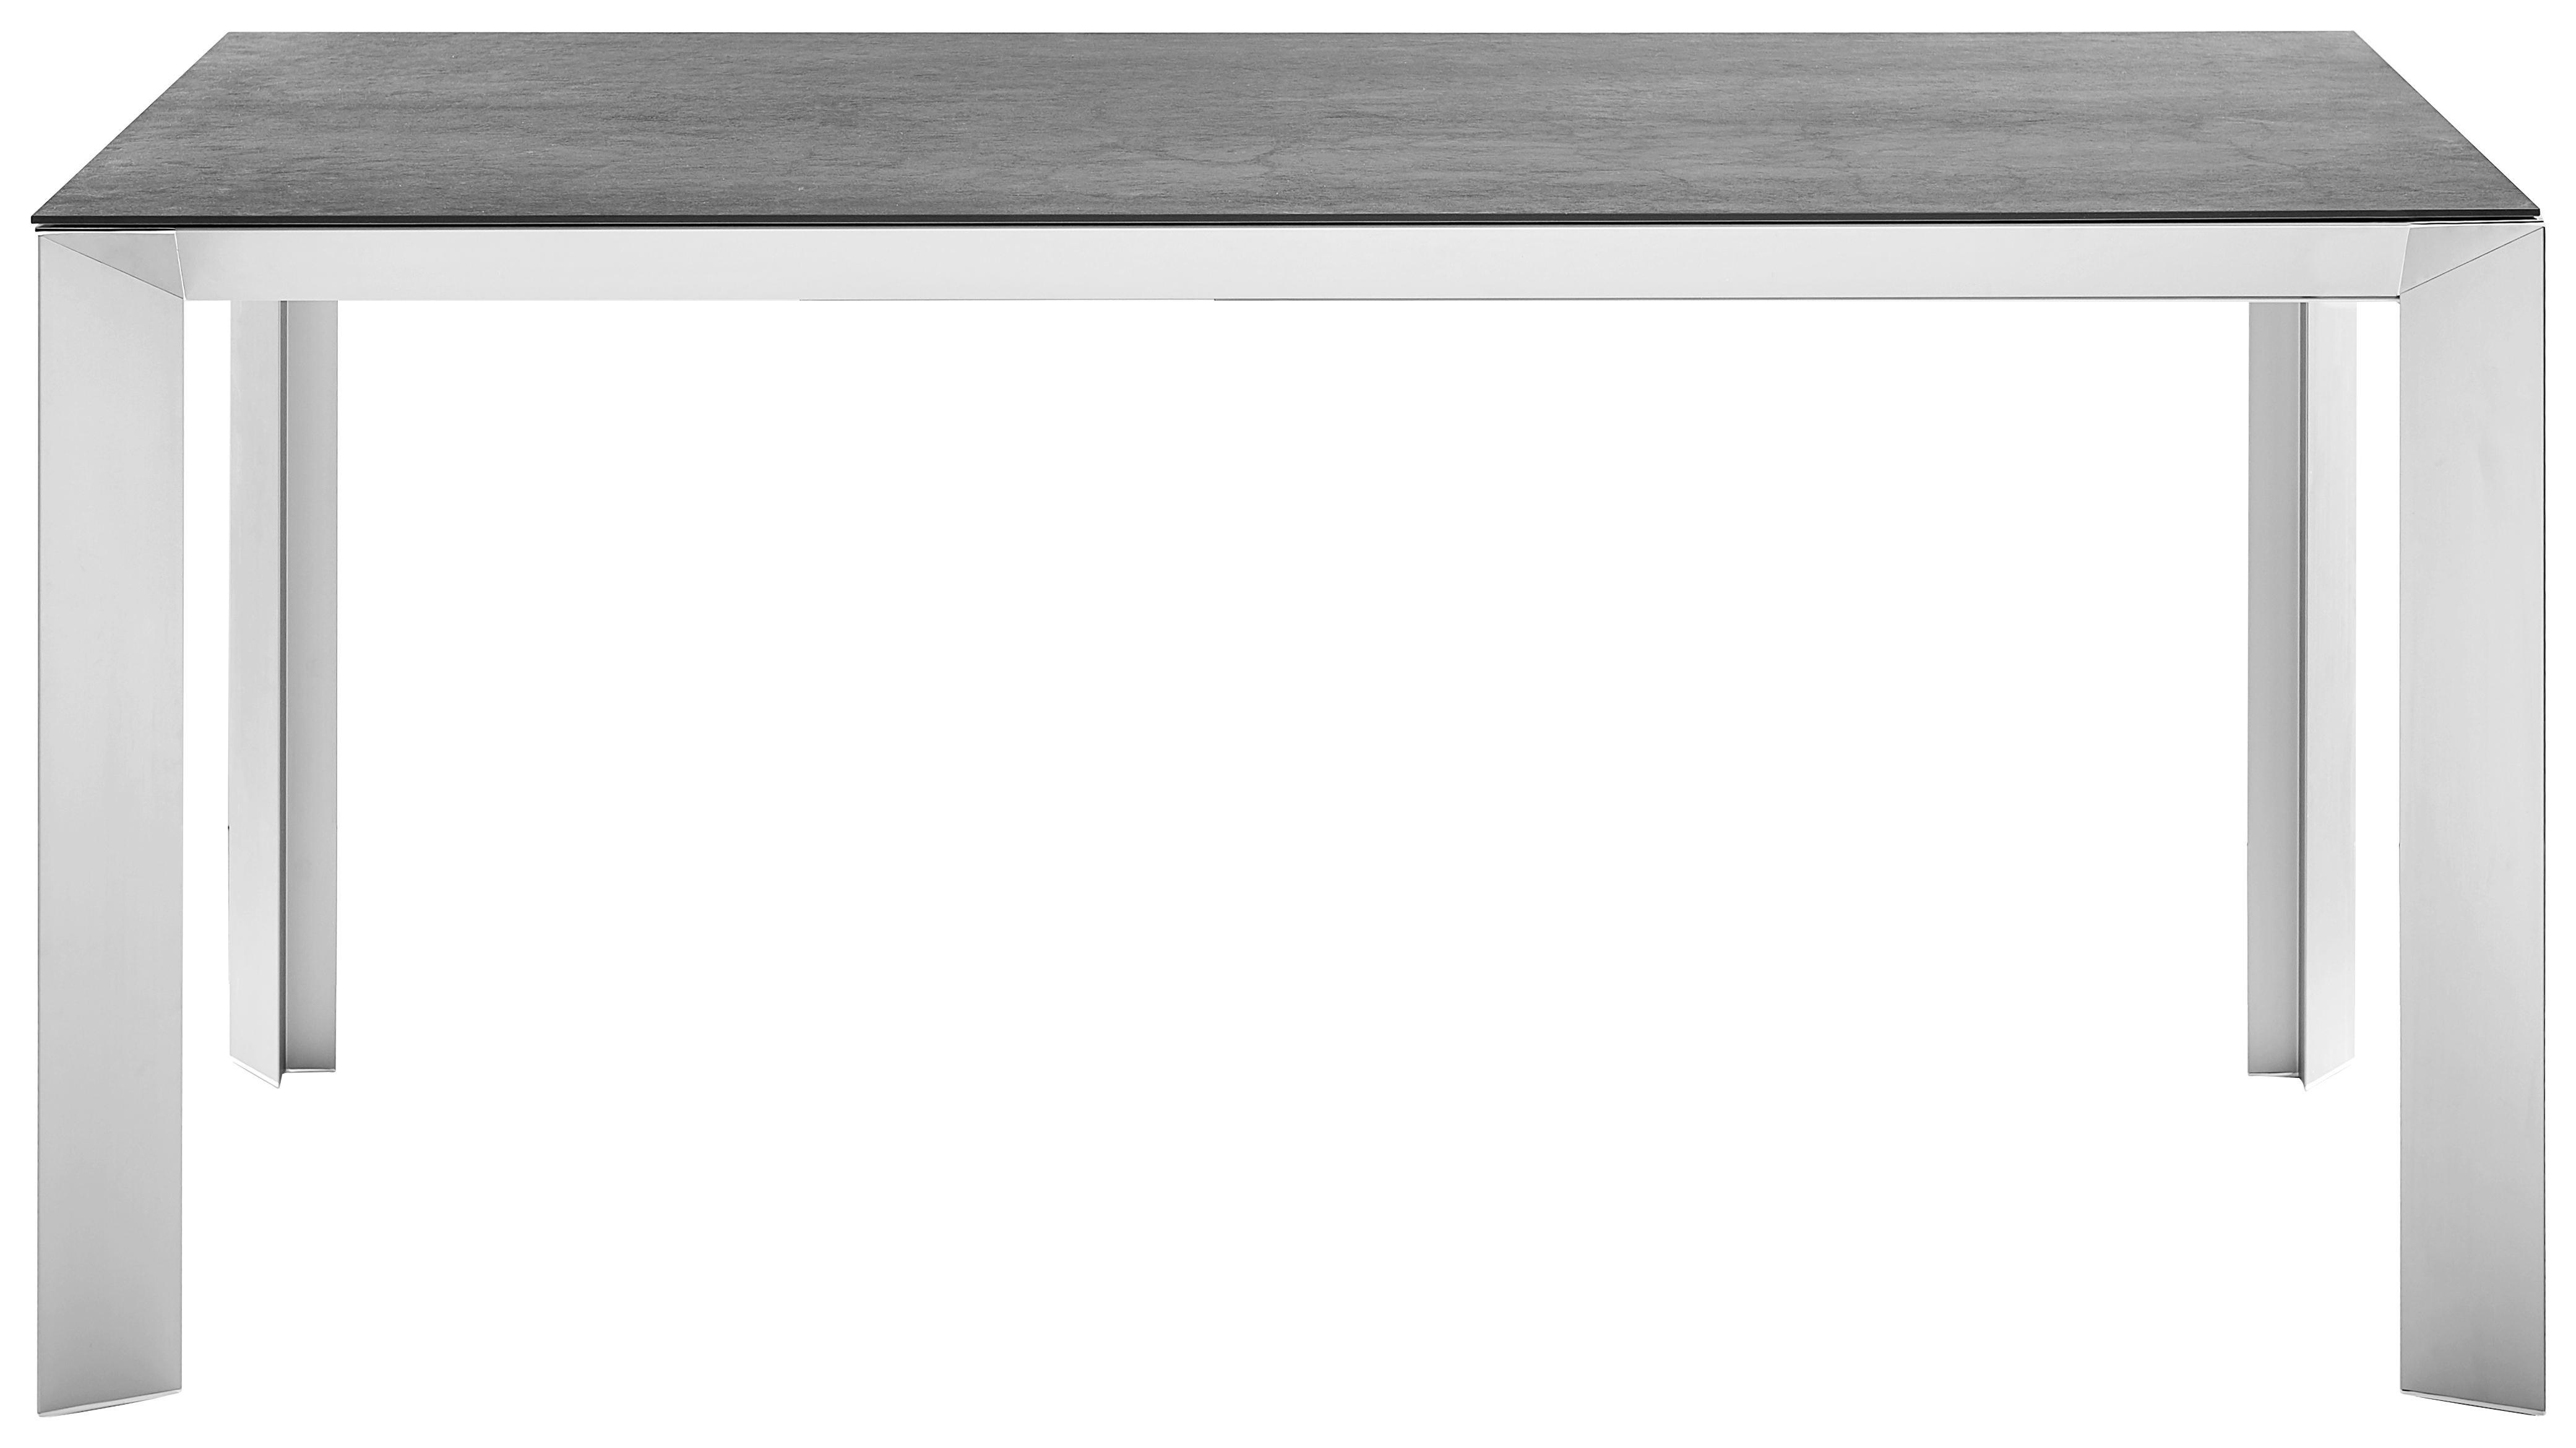 ESSTISCH rechteckig Anthrazit, Champagner - Champagner/Anthrazit, Design, Metall (160(220)/90/76cm) - NOVEL